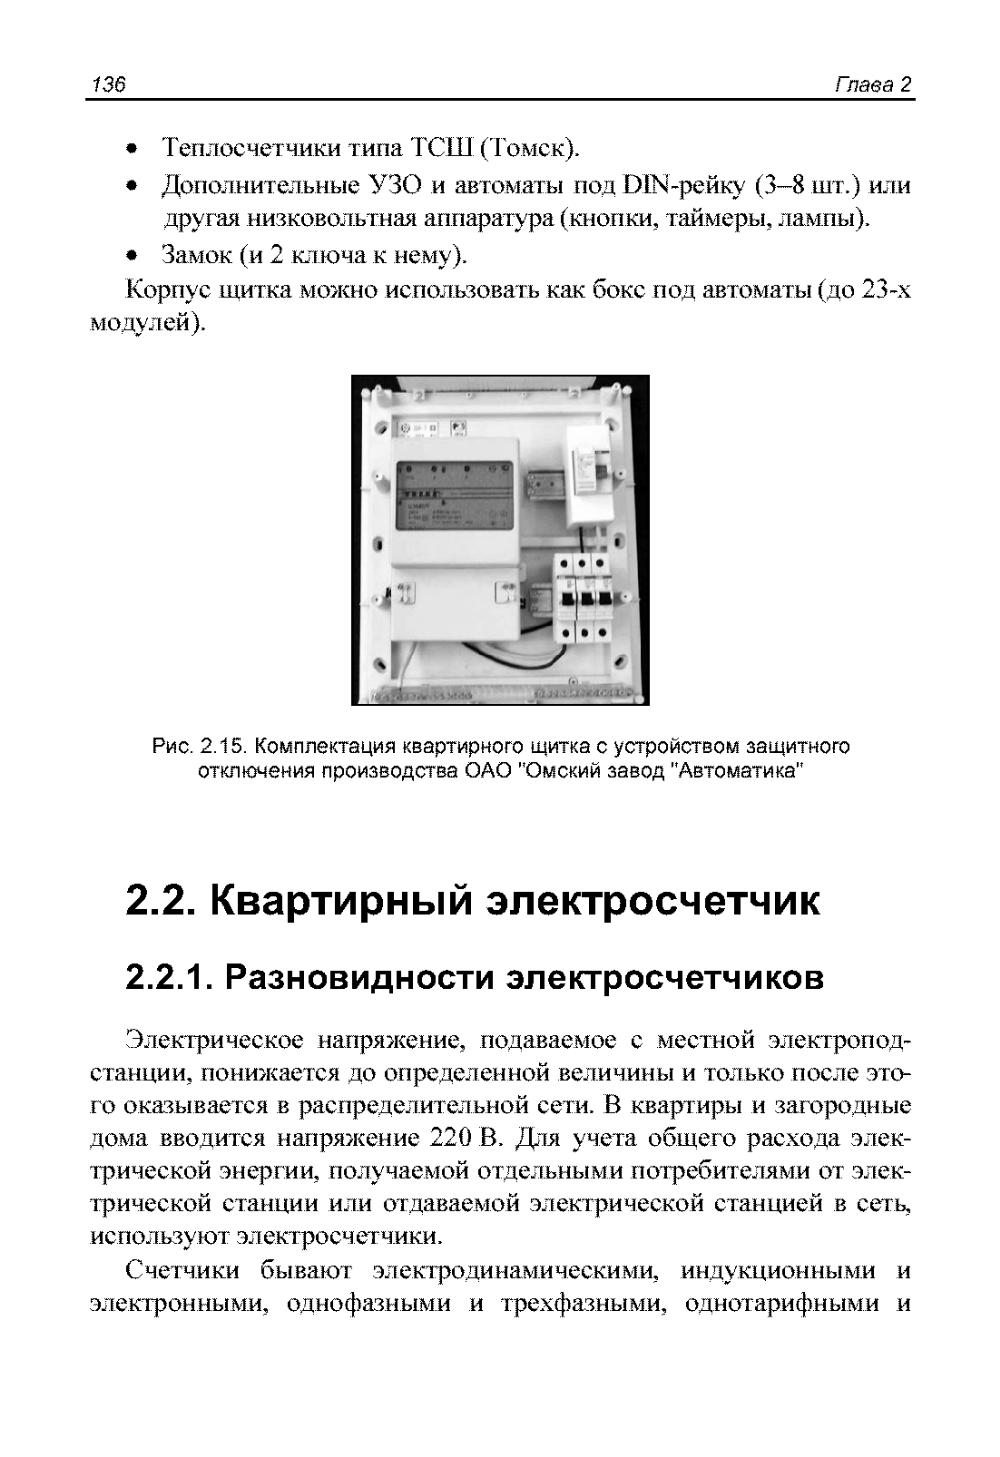 http://i5.imageban.ru/out/2013/12/05/437579676dde43b328d36e2851fa0578.jpg